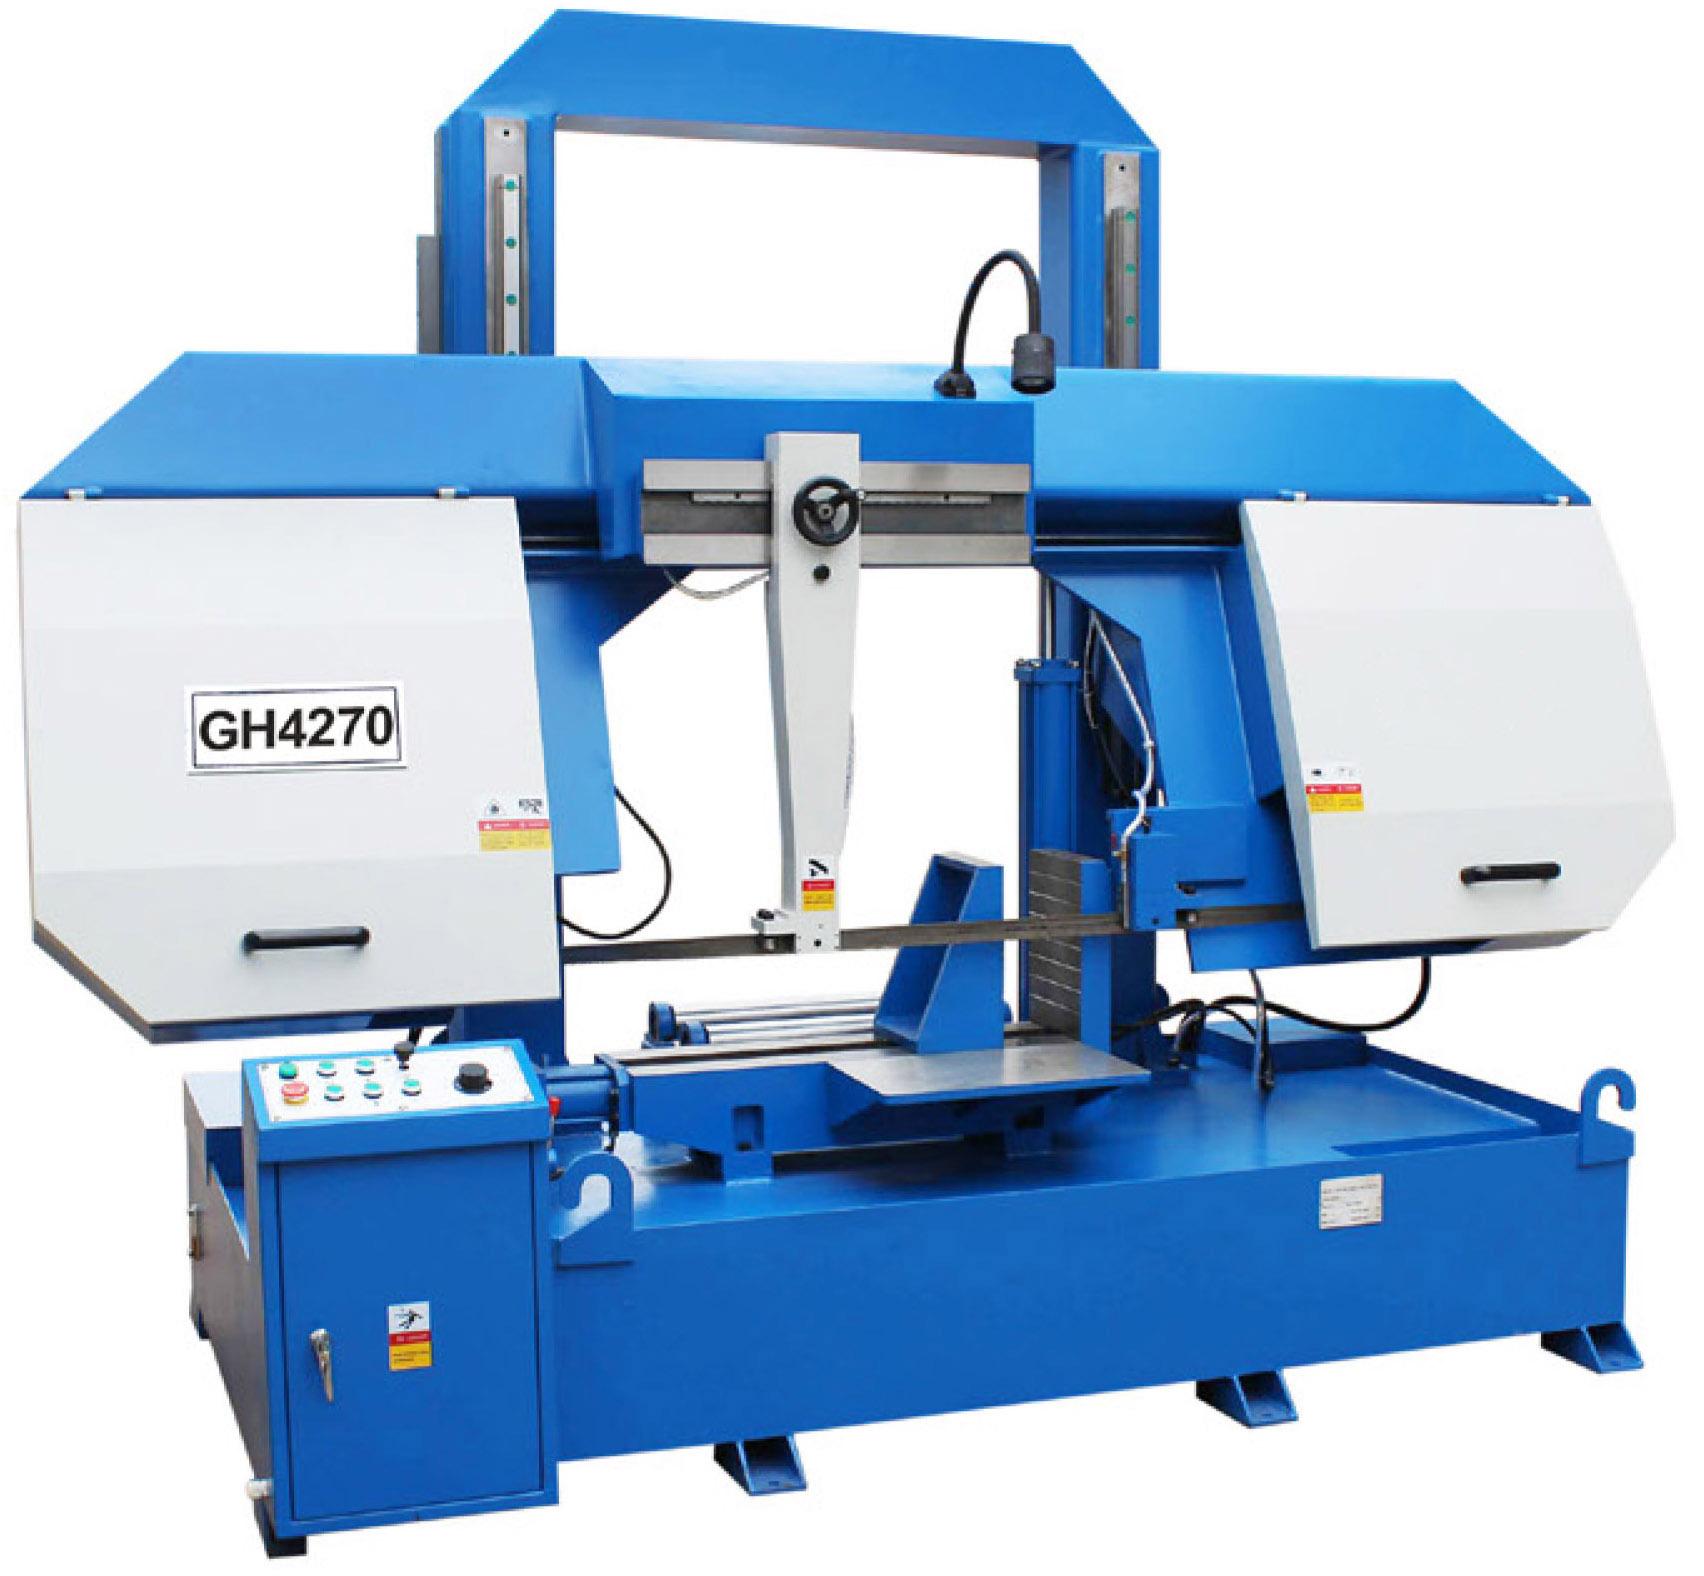 GH4270 (2)